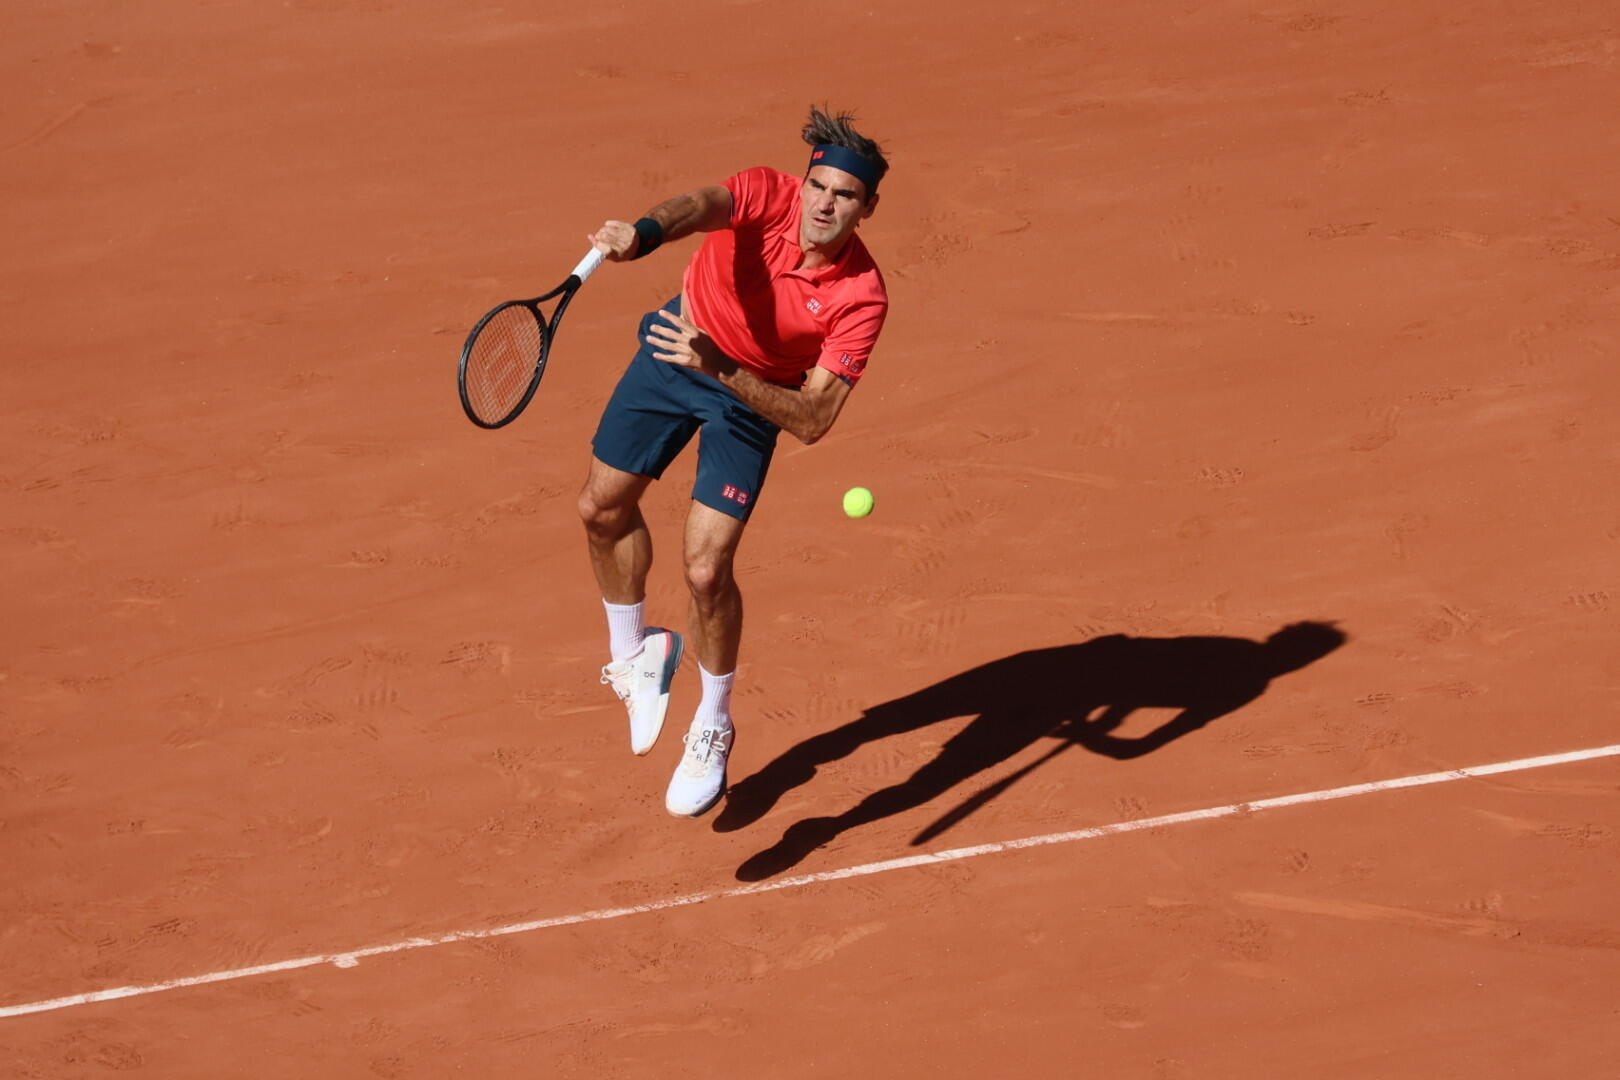 roland-Garros roger federer retour